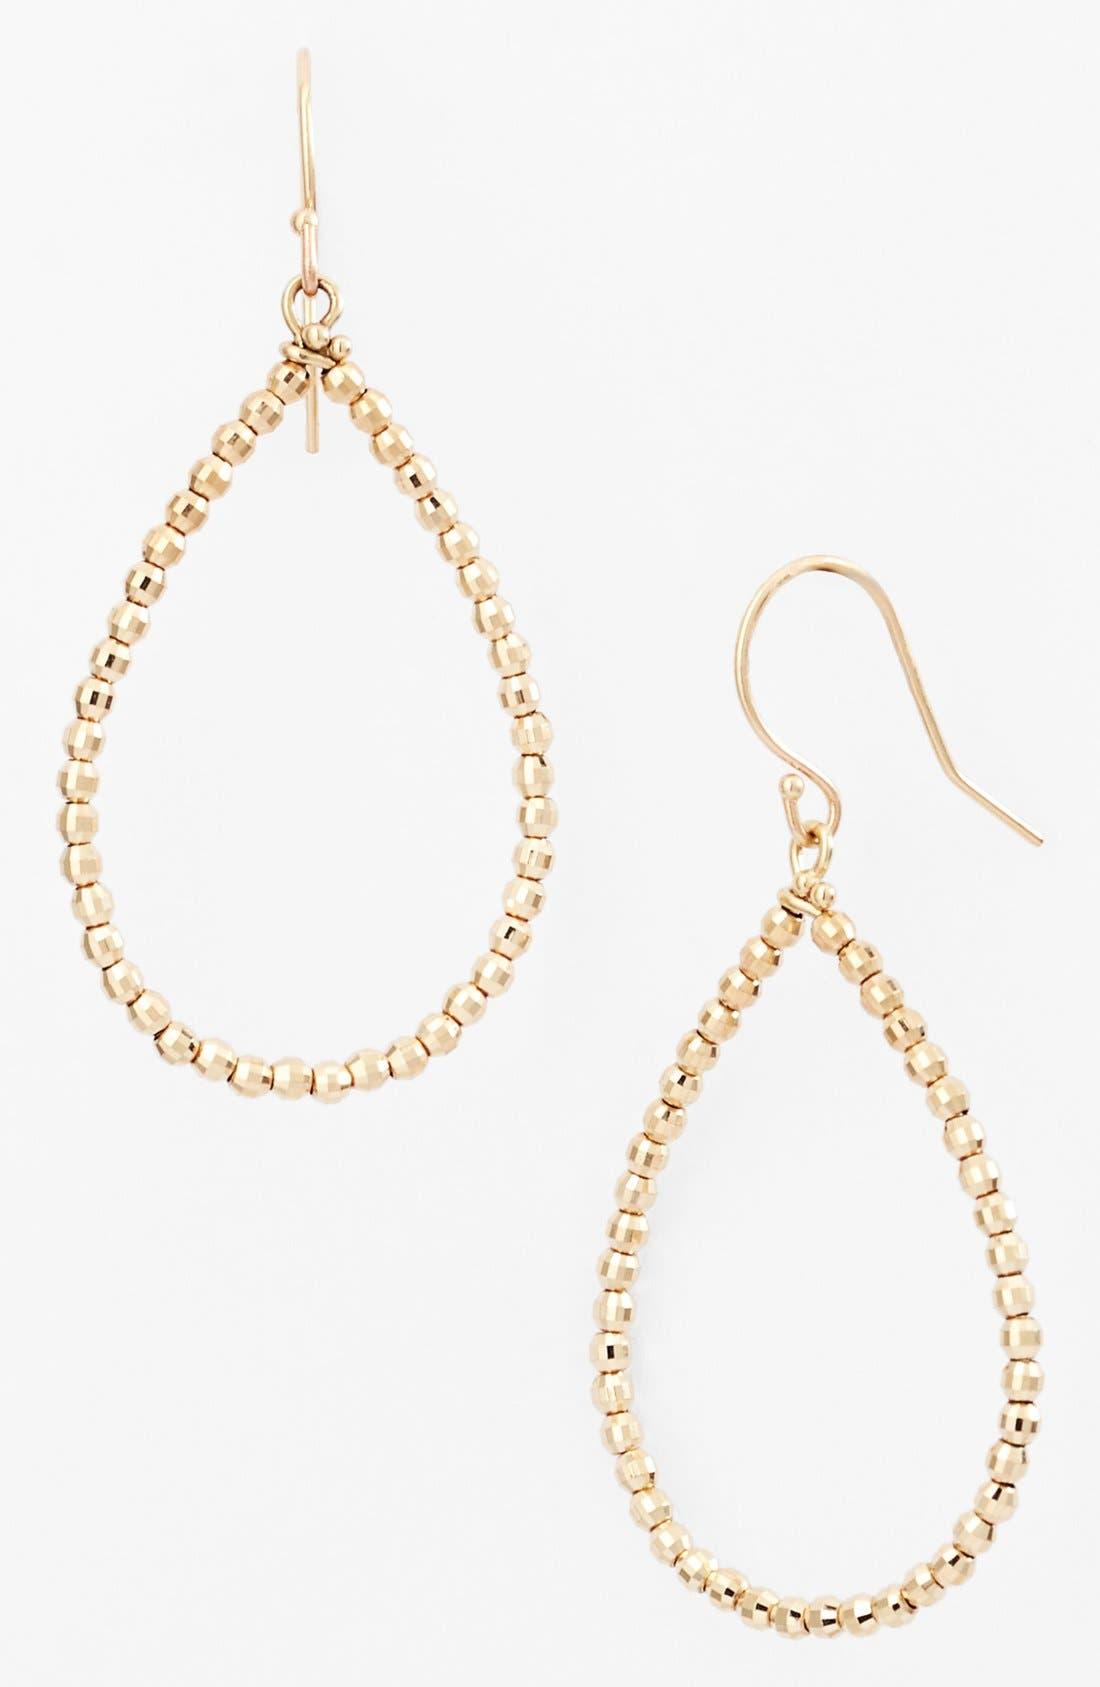 Alternate Image 1 Selected - Mizuki 'Cut Beads' Open Teardrop Earrings